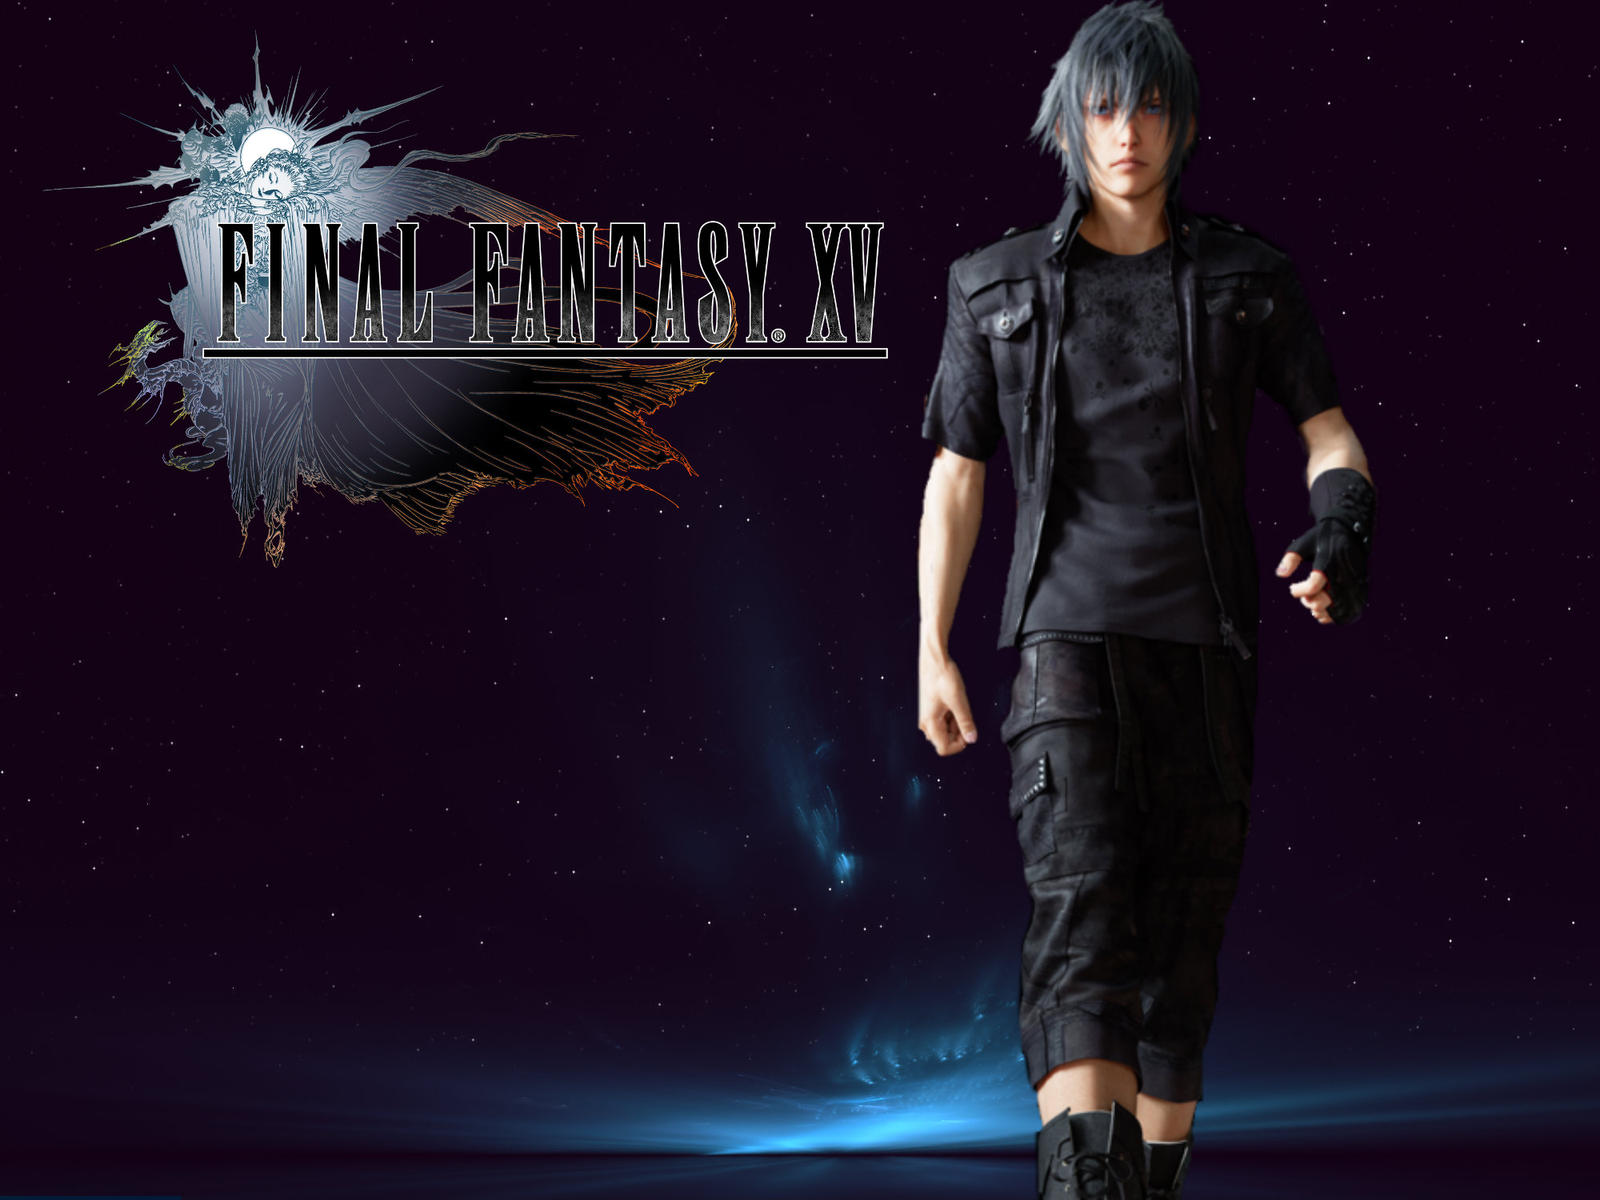 Final Fantasy Xv Noctis Hd Games 4k Wallpapers Images: Final Fantasy Noctis Wallpaper